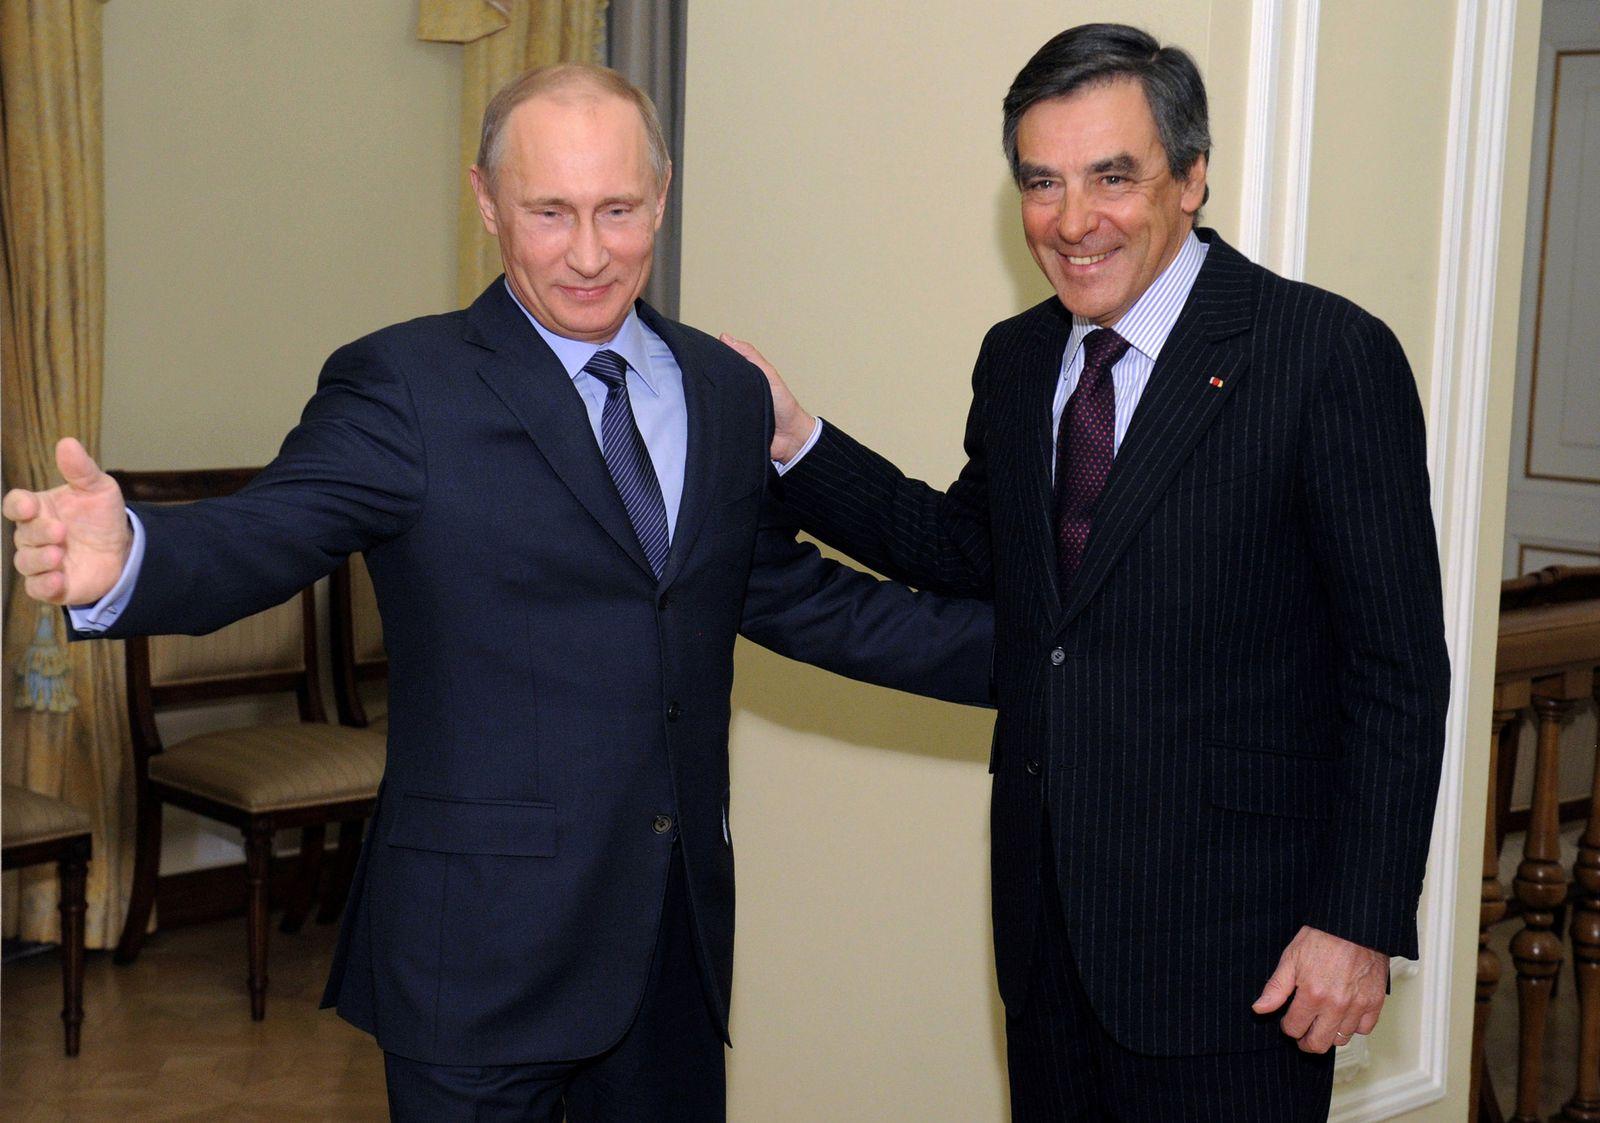 Wladimir Putin / Francois Fillon